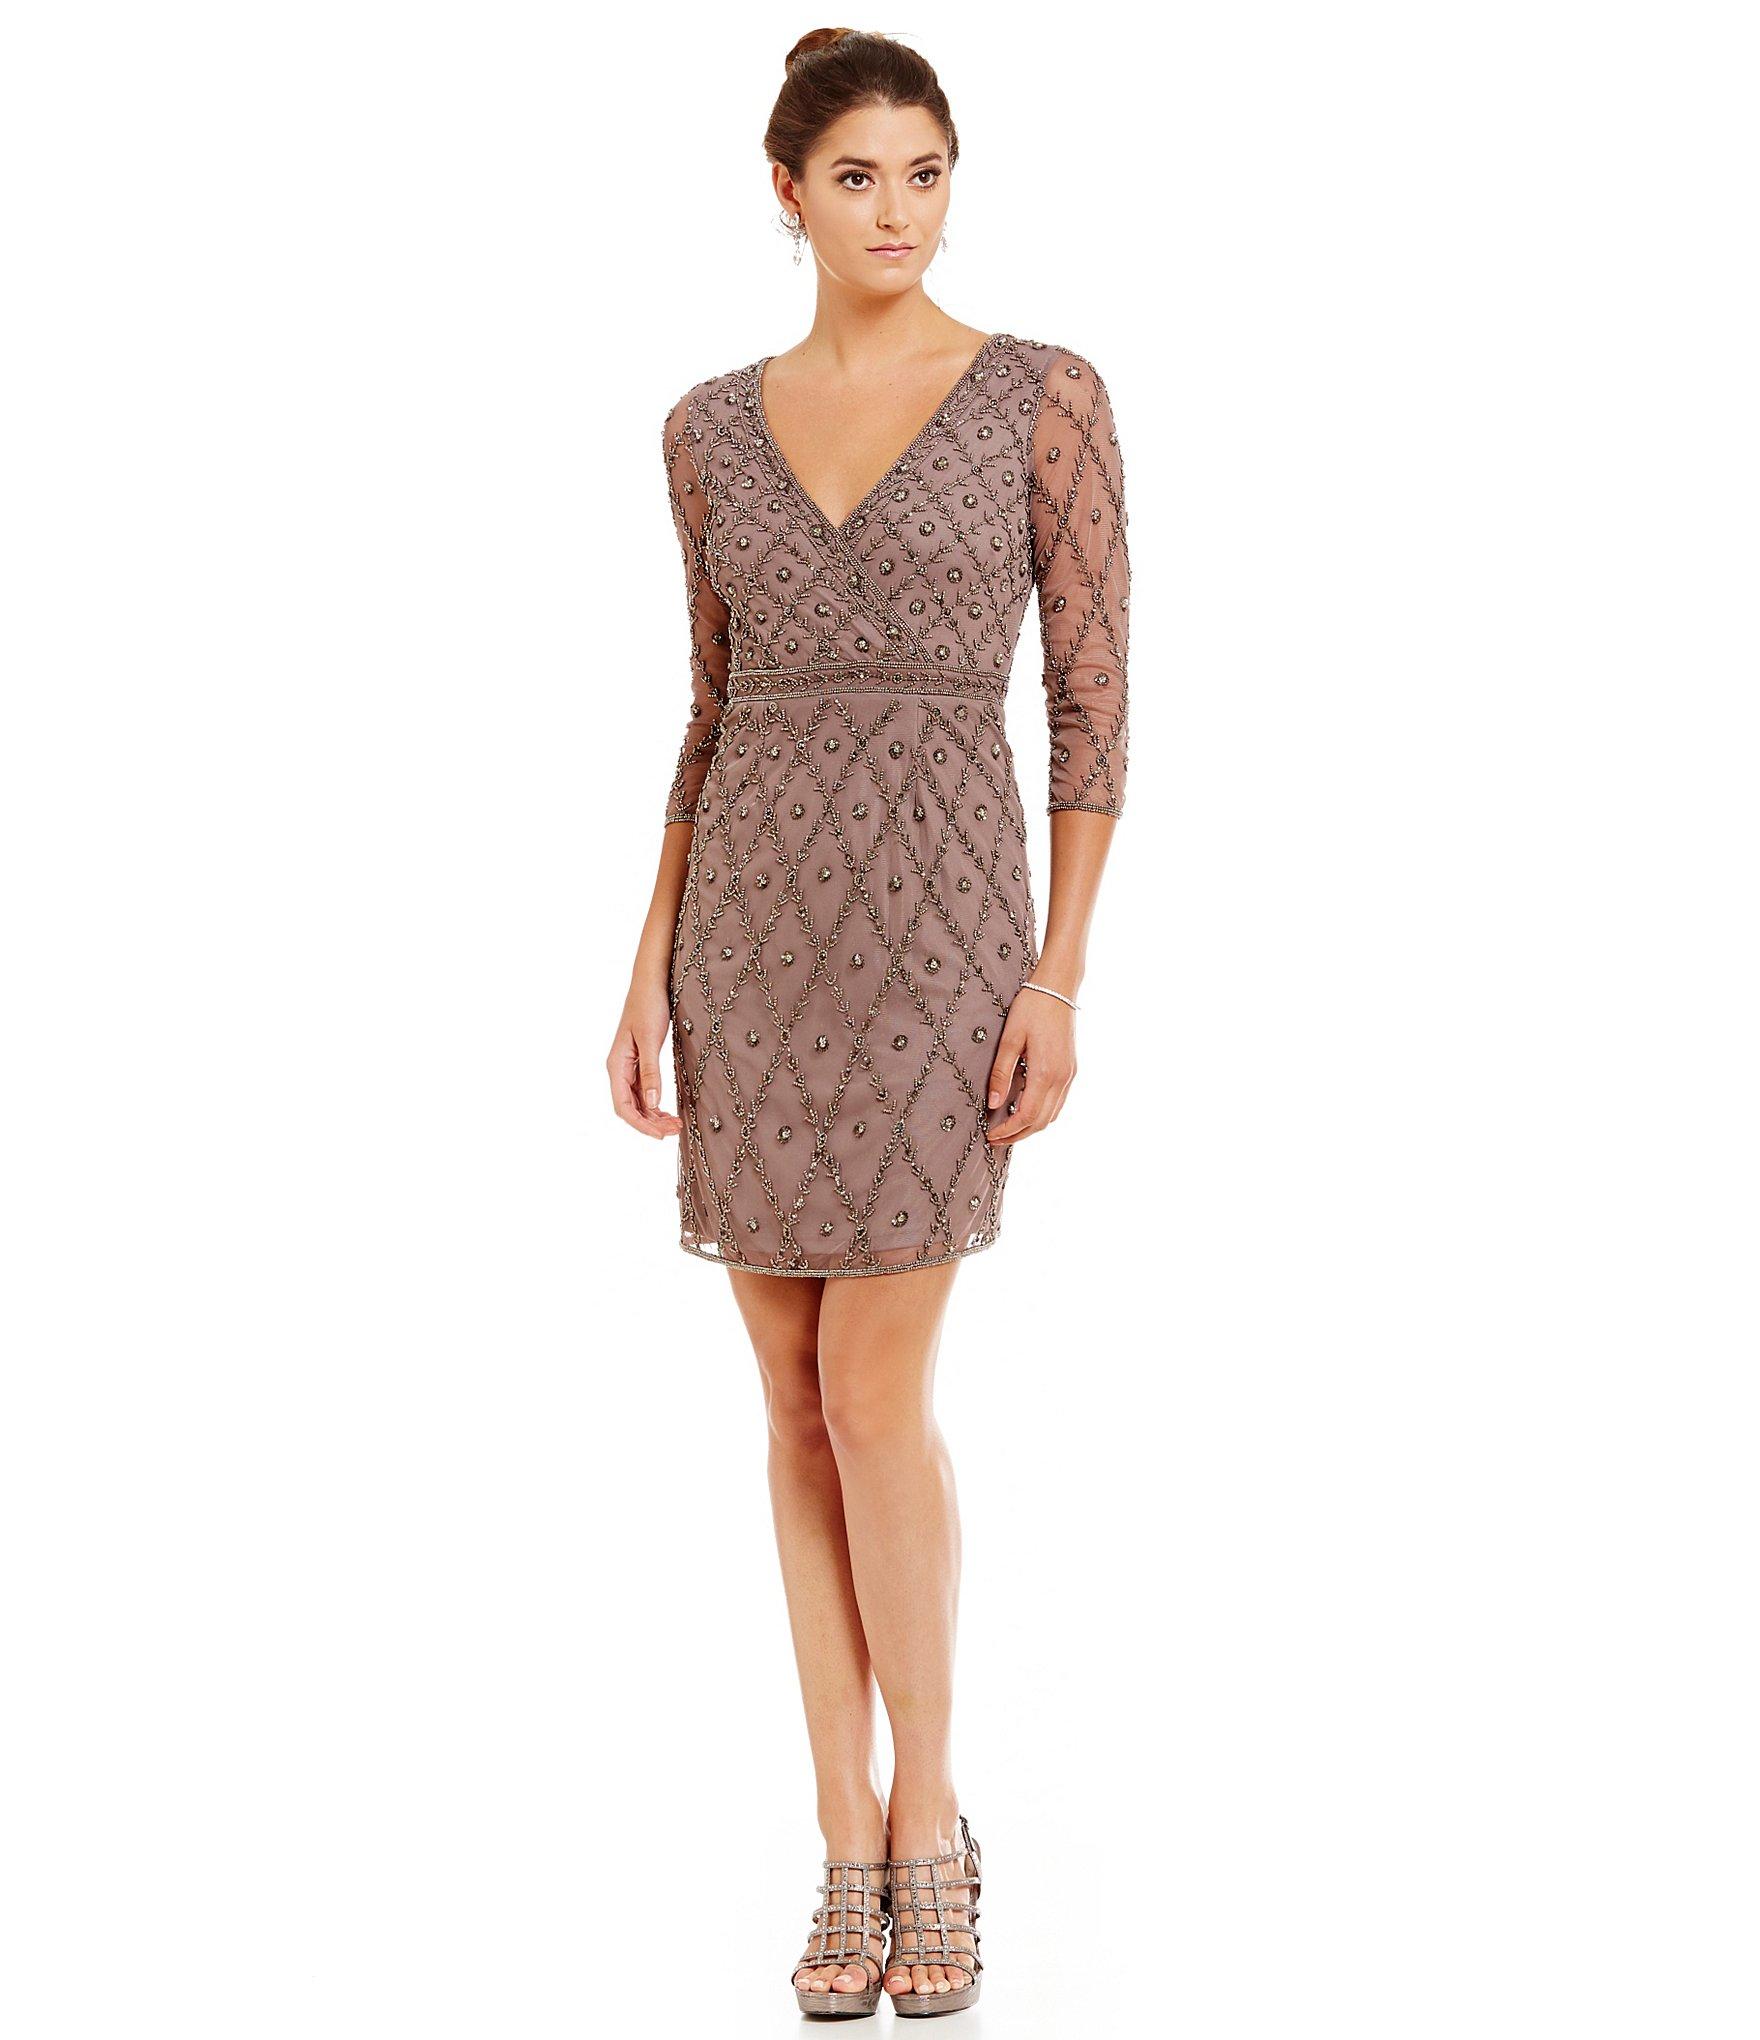 Images of Dillards Long Black Dress - Giftlist